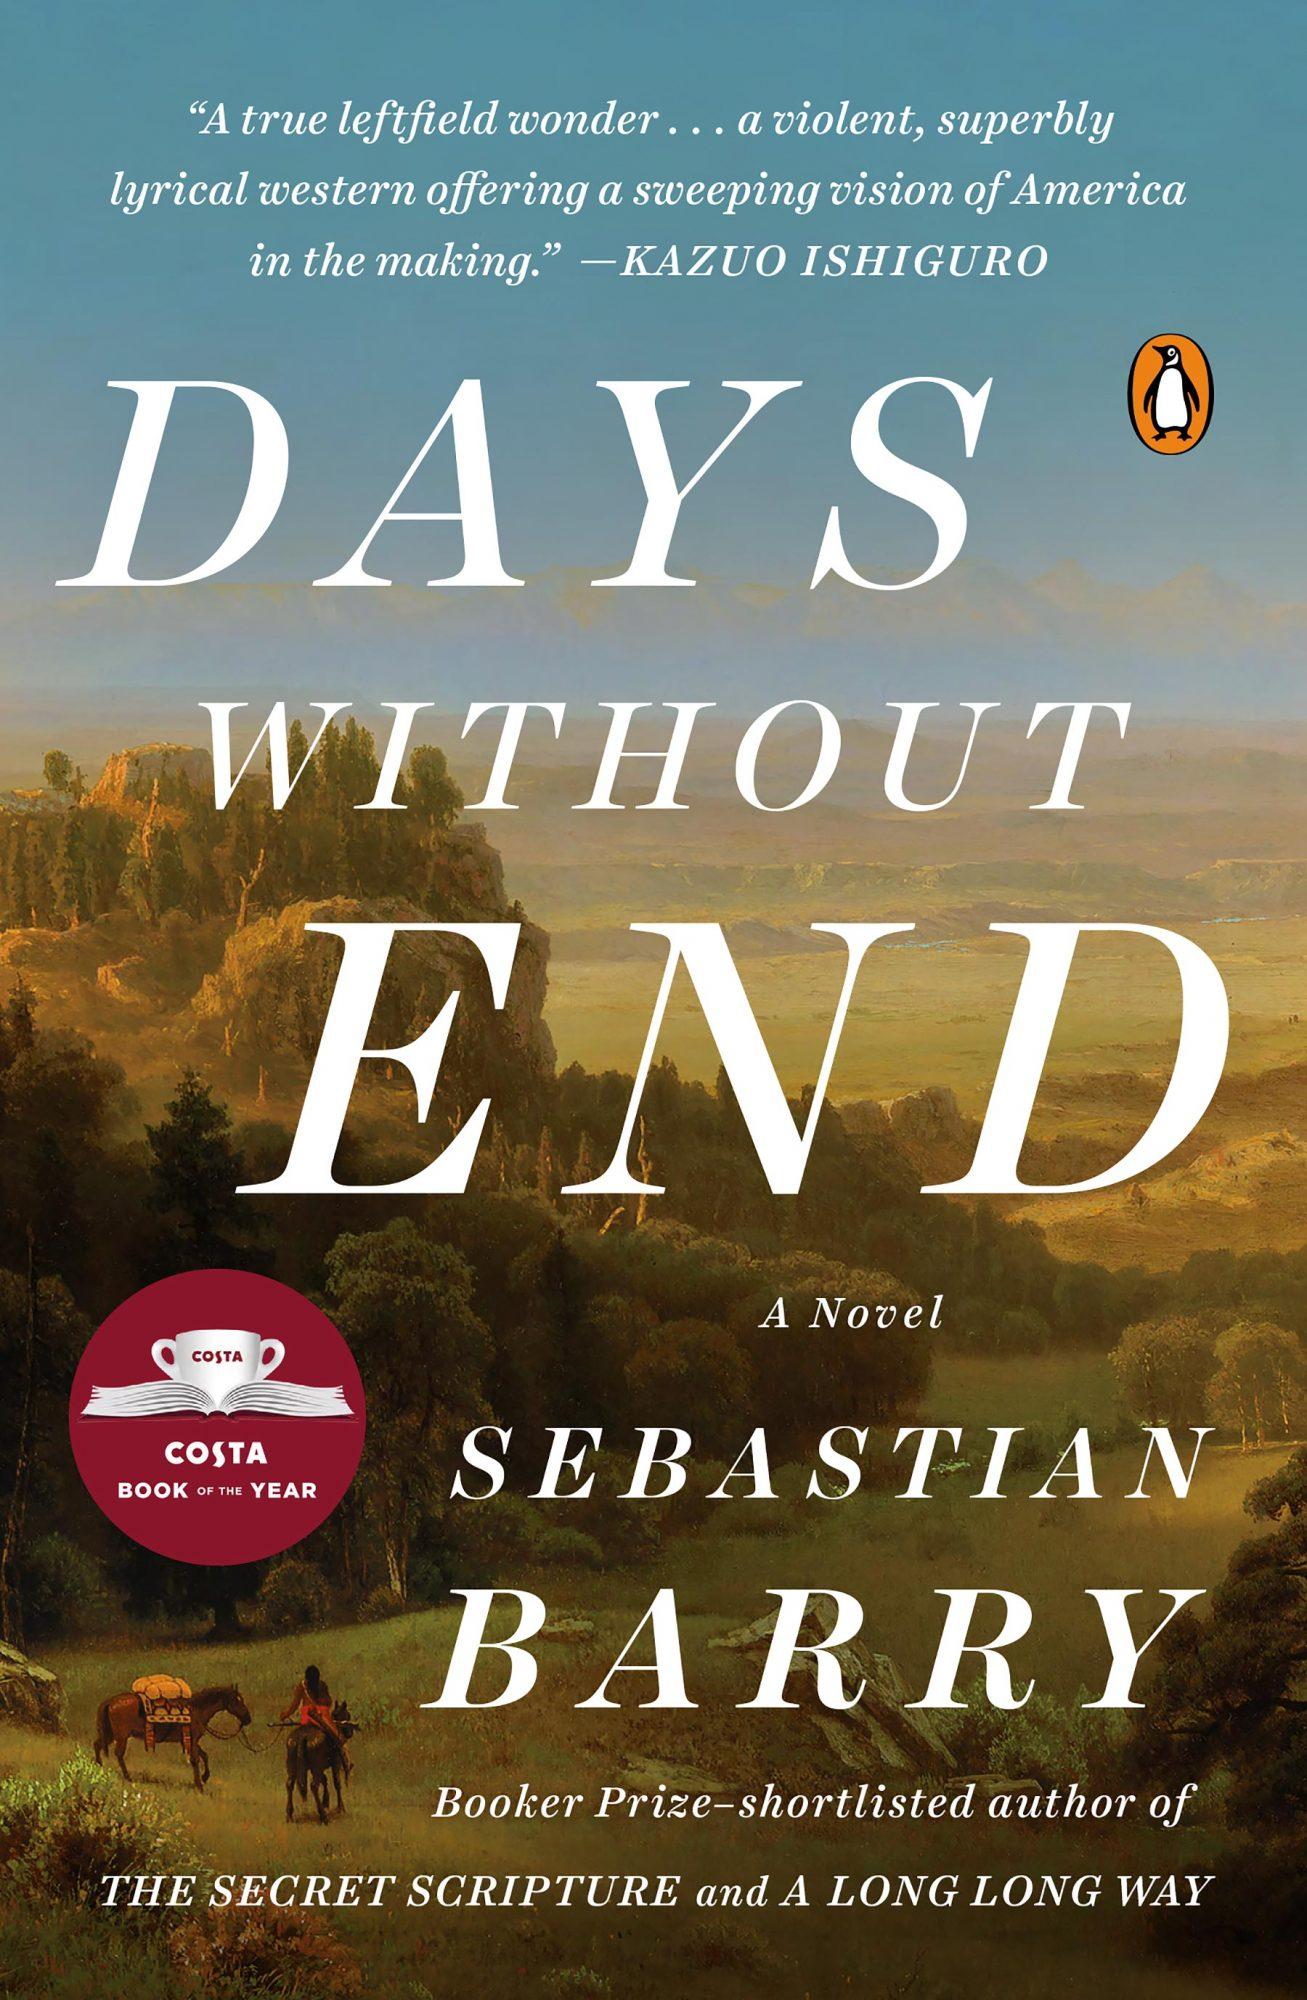 Days Without EndA NOVELBy SEBASTIAN BARRYCR: Penguin Random House